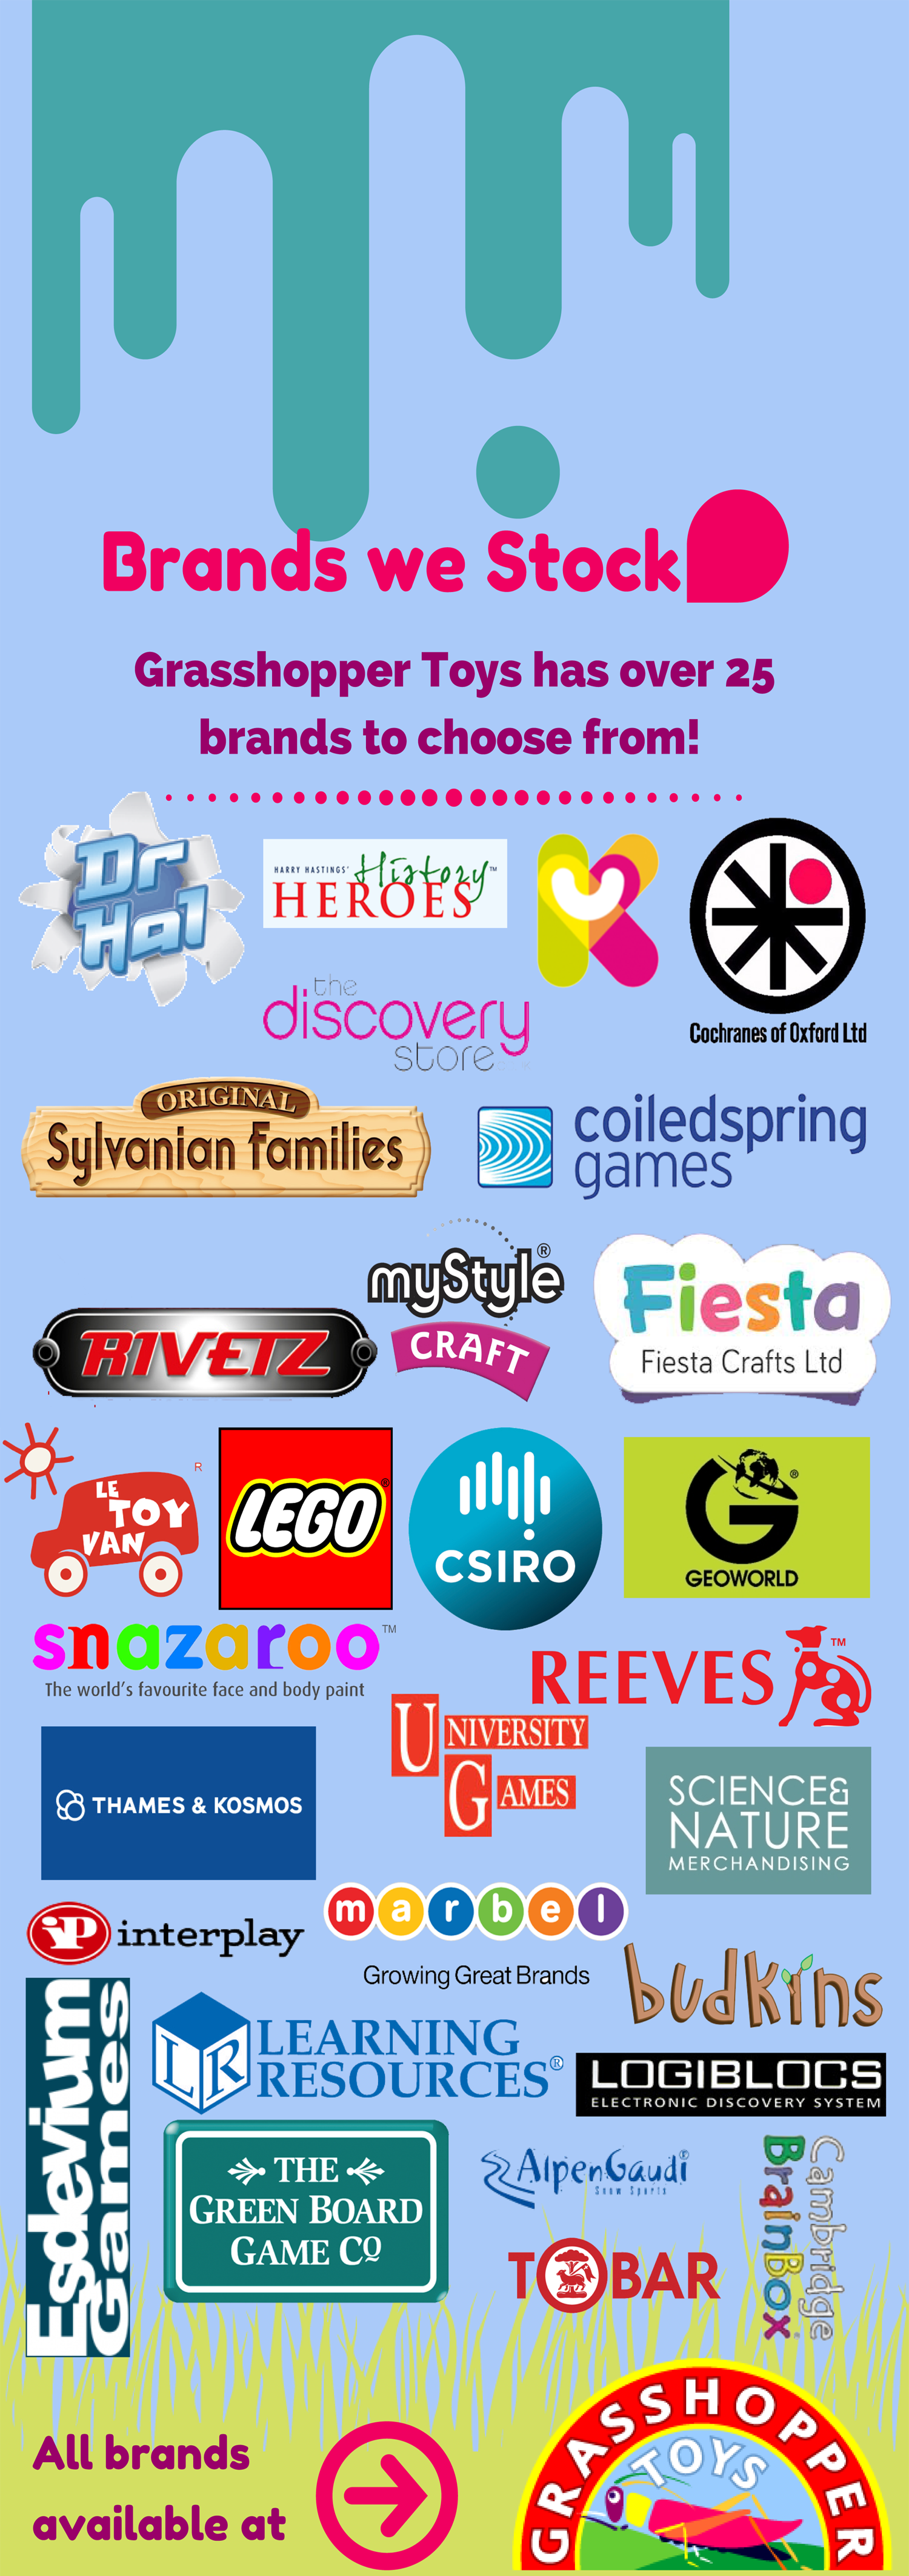 #Infographic - The Brands Grasshopper Toys stock!